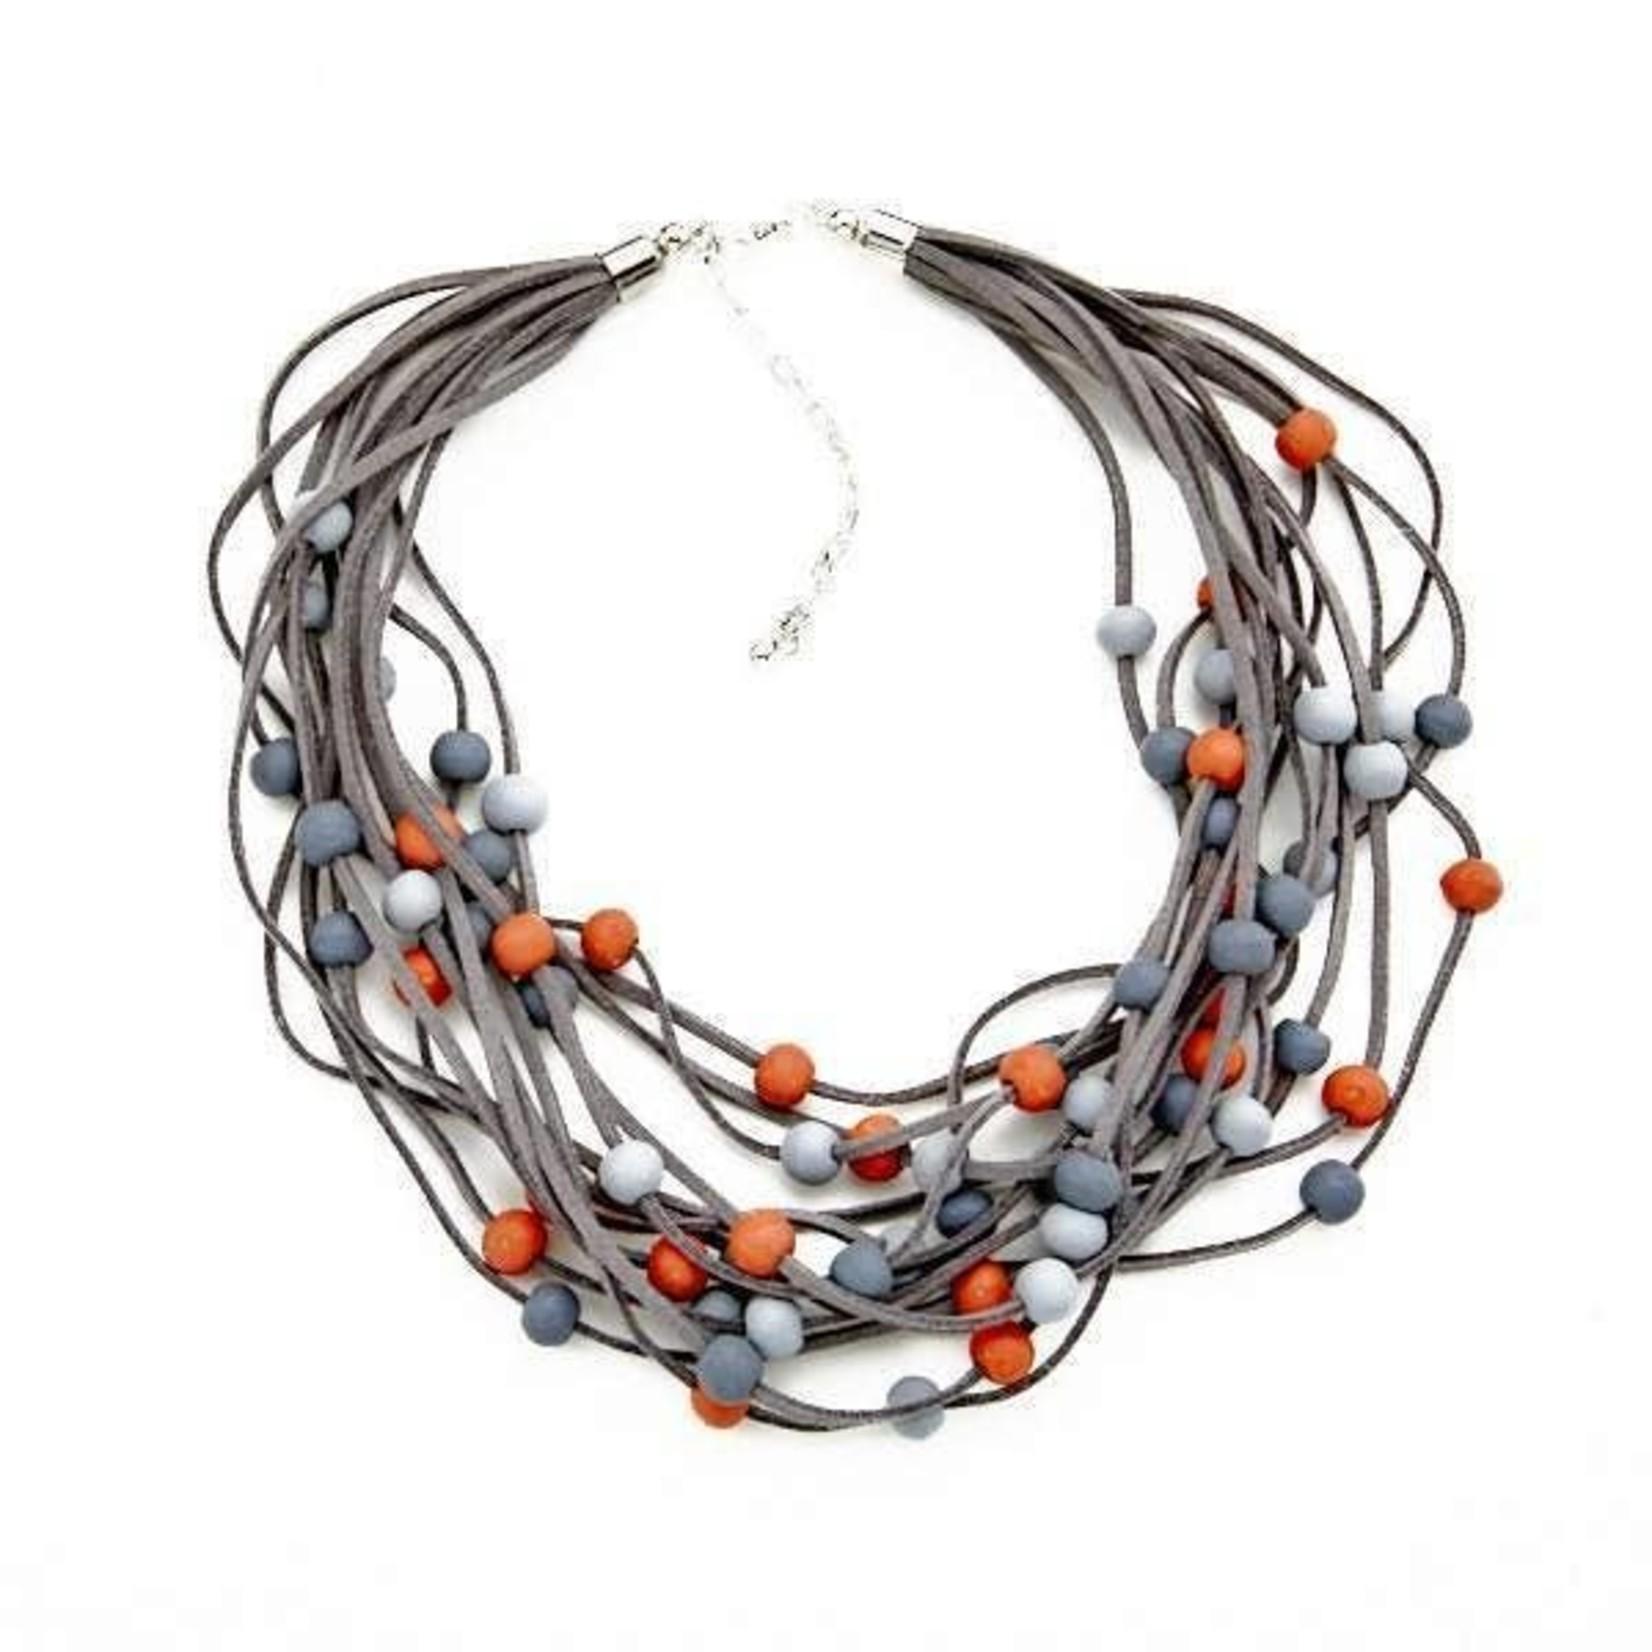 Suzie Blue Canada Orange & Grey Multi-Str Short Suede Nckl w/Wooden Balls